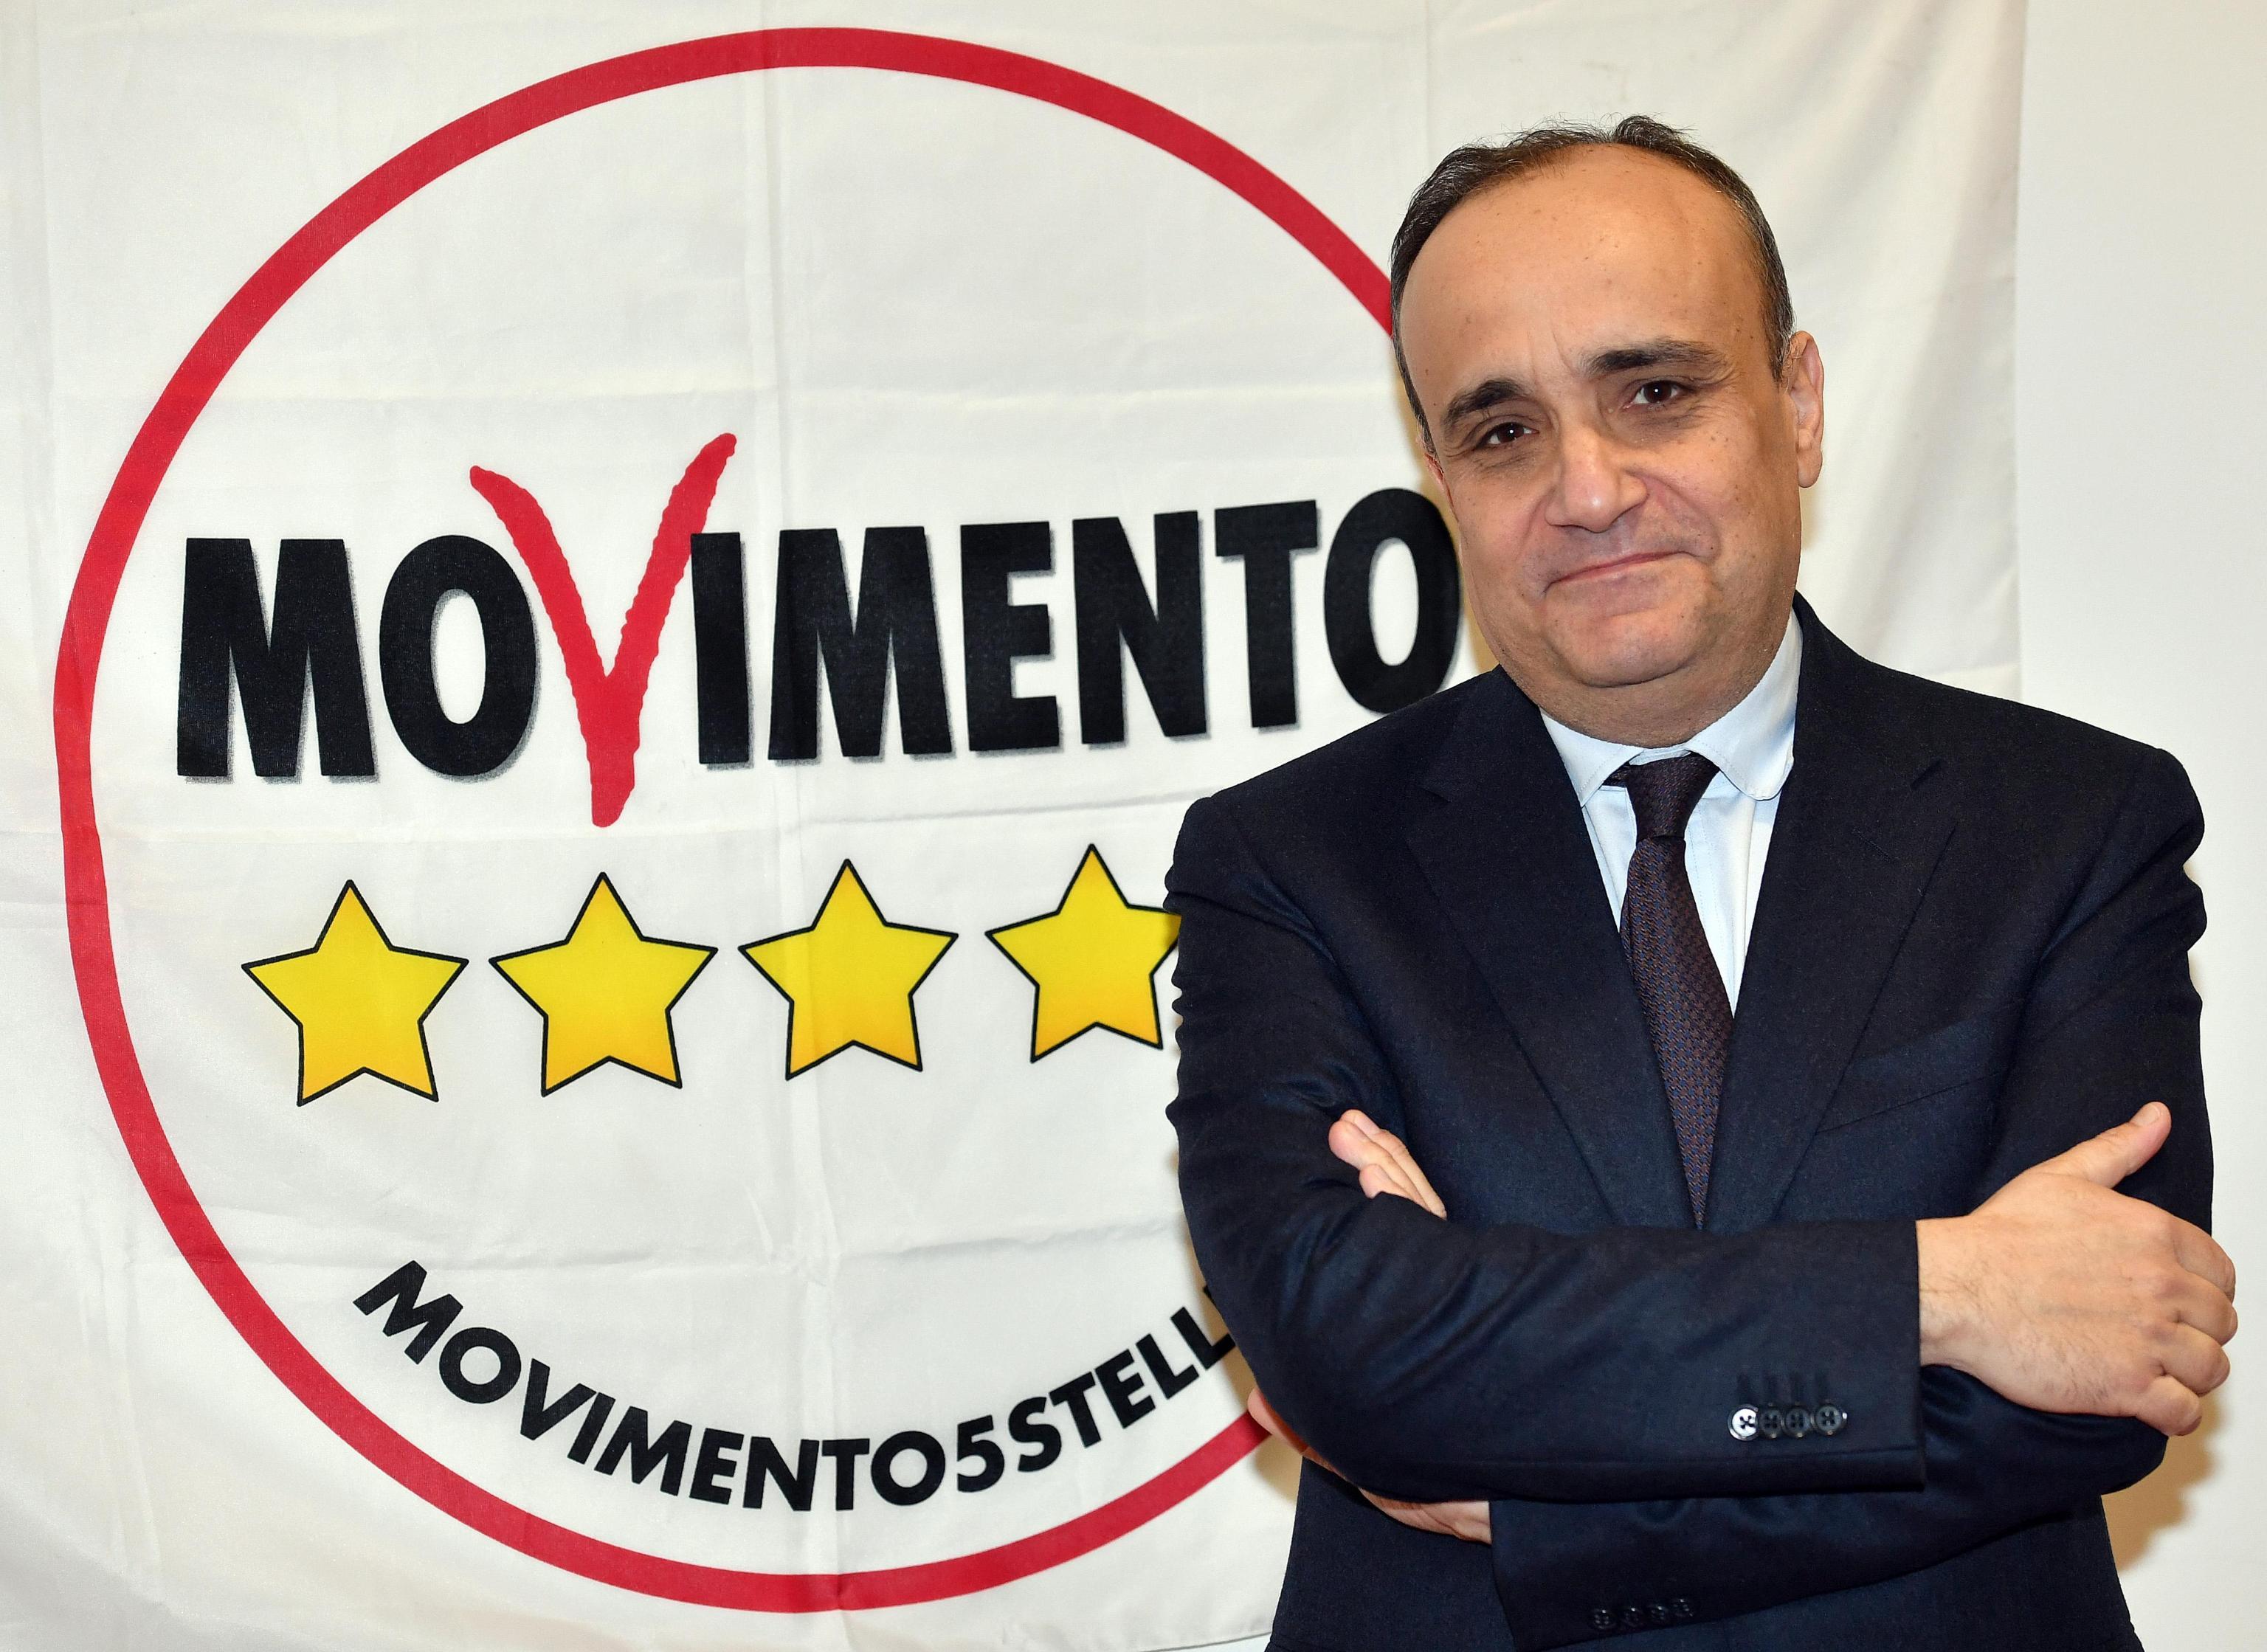 Alberto Bonisoli M5S